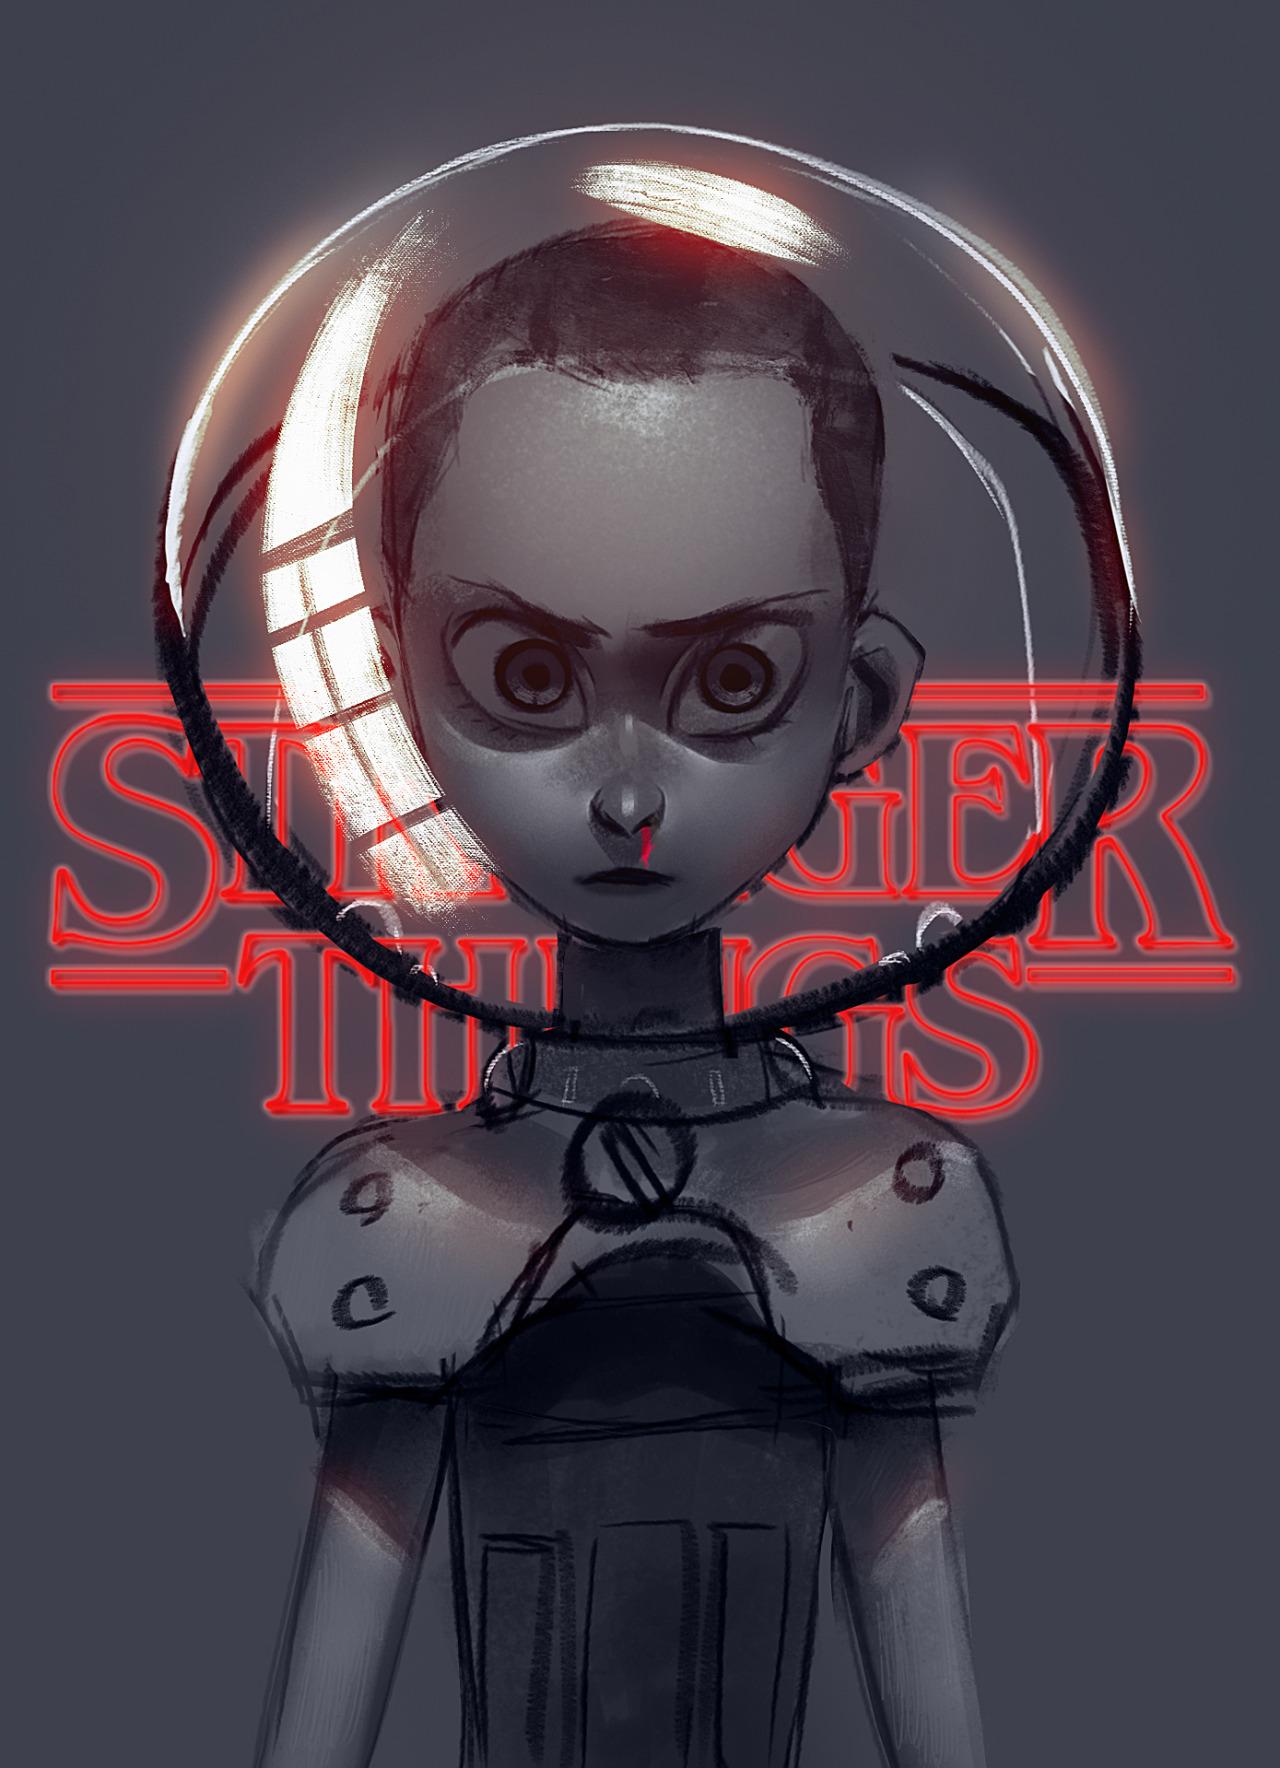 Stranger Things Fan Art and Illustrations